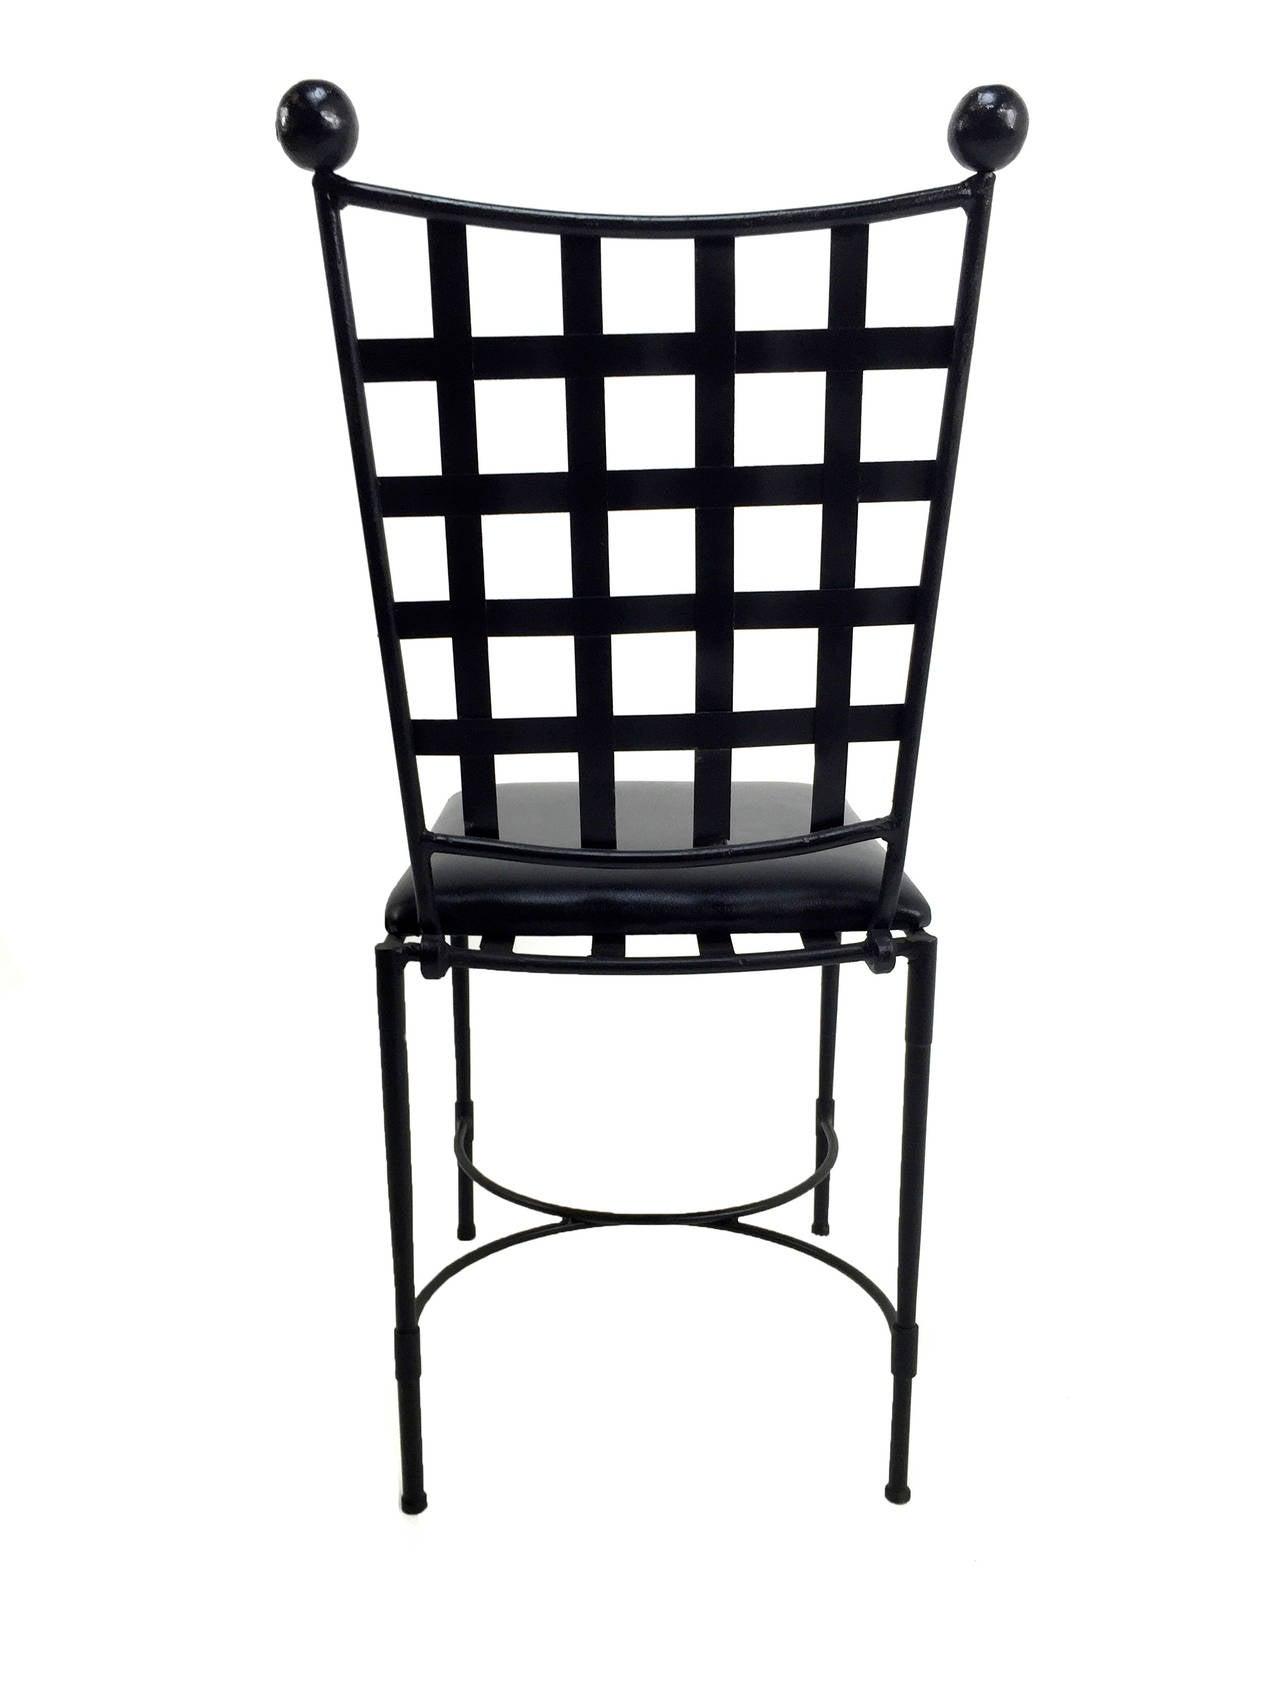 Mario Papperzini for Salterini Patio Chair Set at 1stdibs